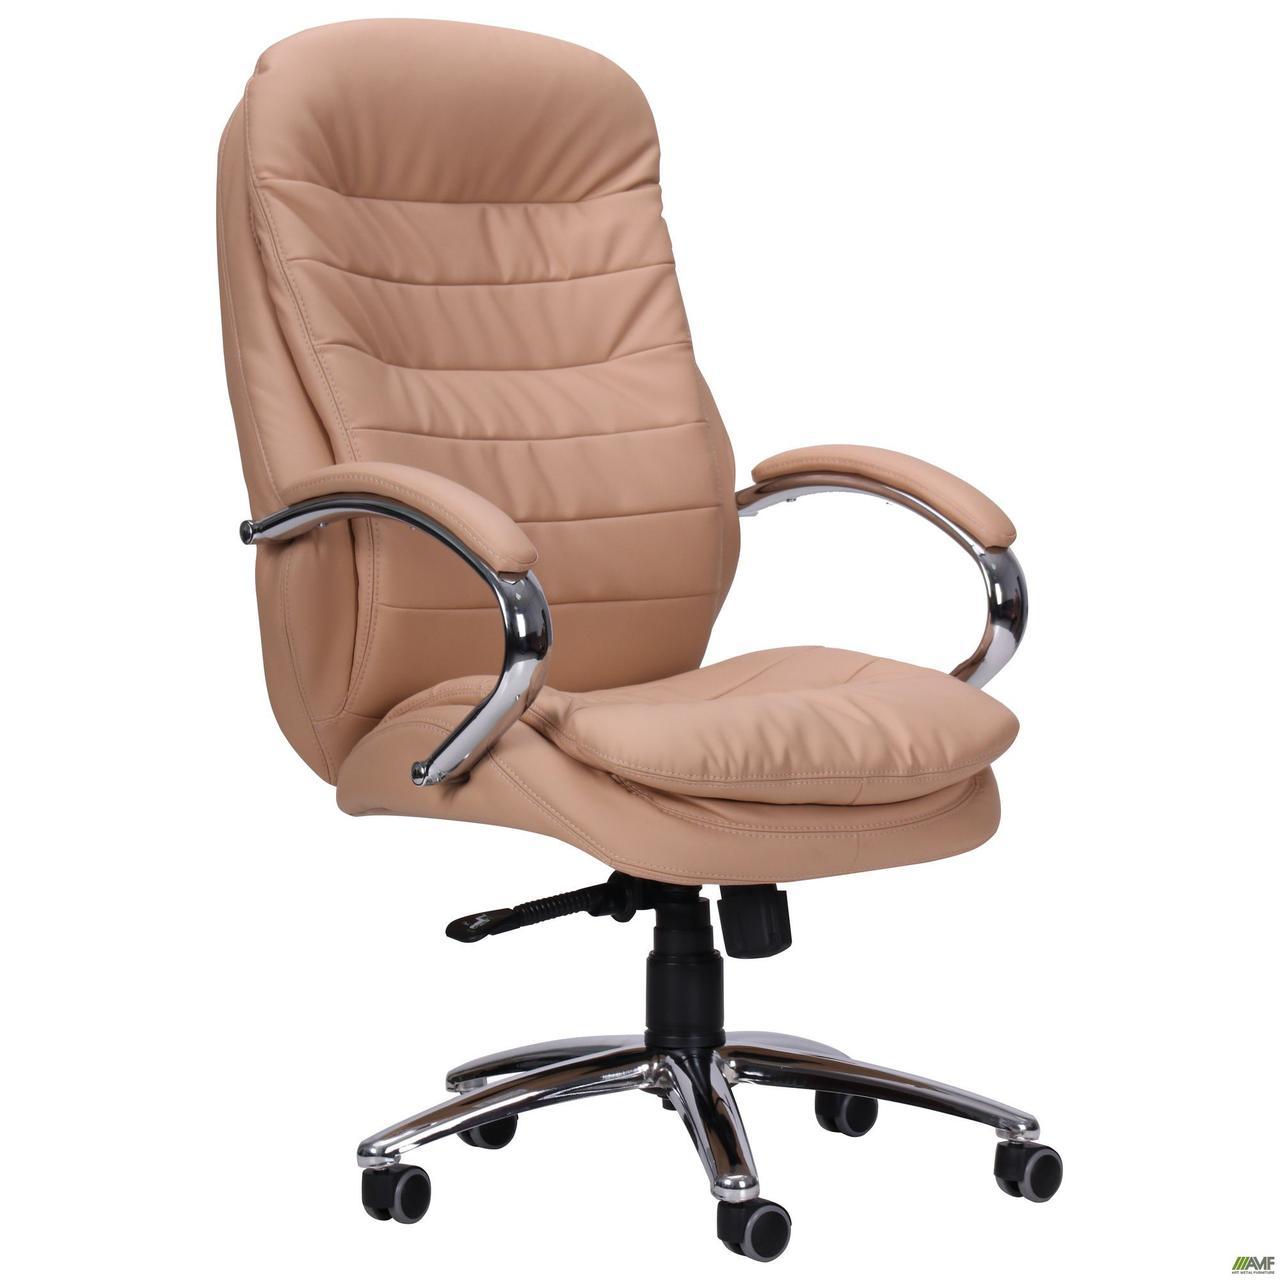 Кресло офисное AMF Валенсия HB Anyfix бежевое